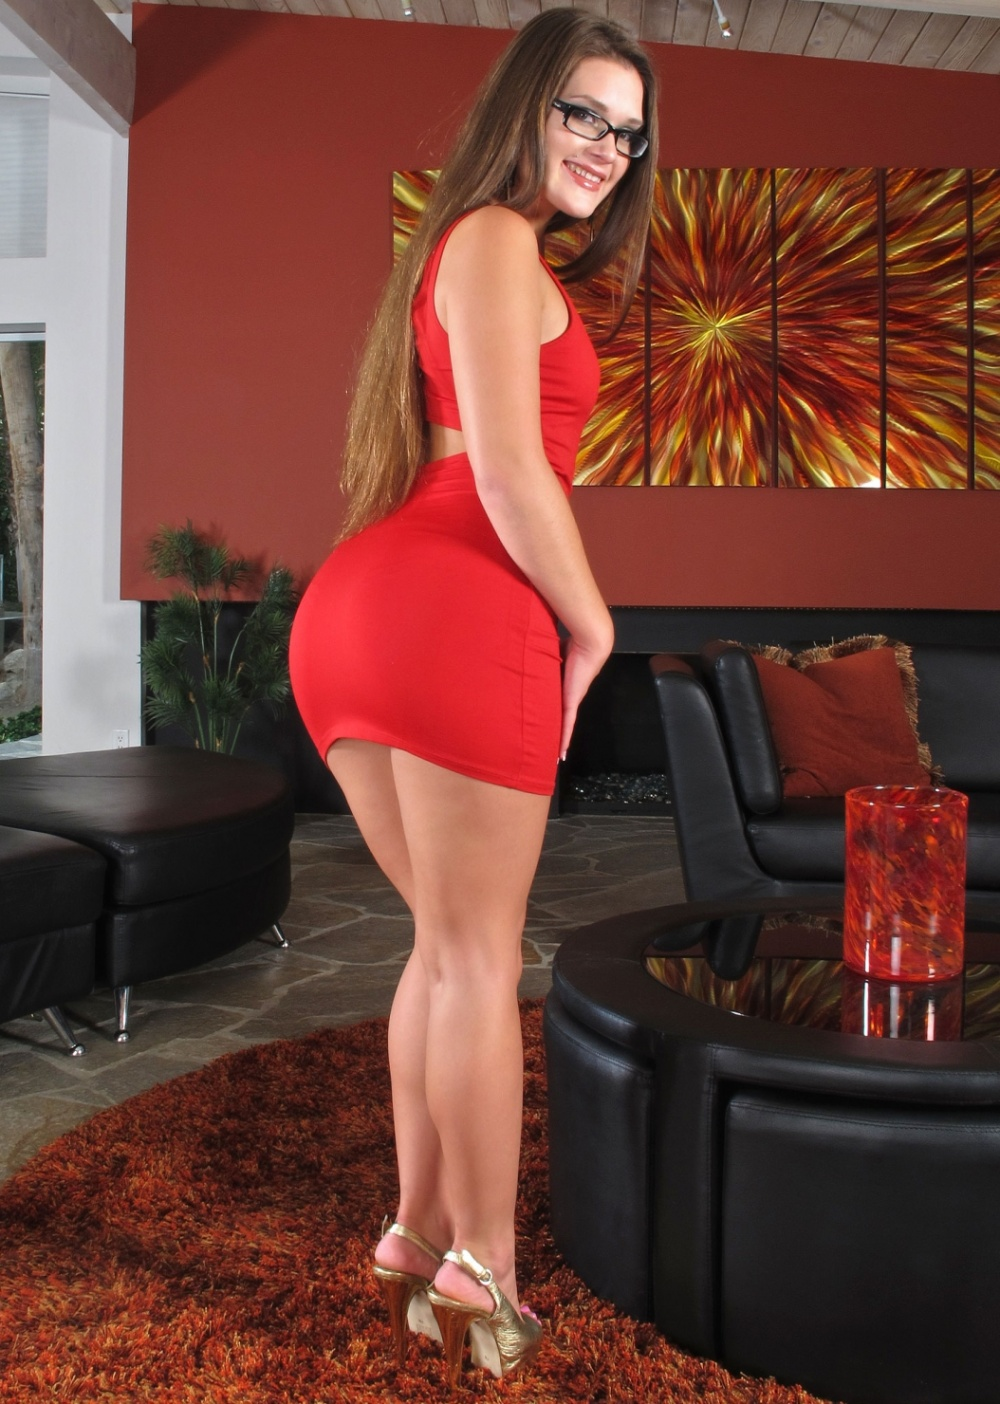 Kimberly alexander naked